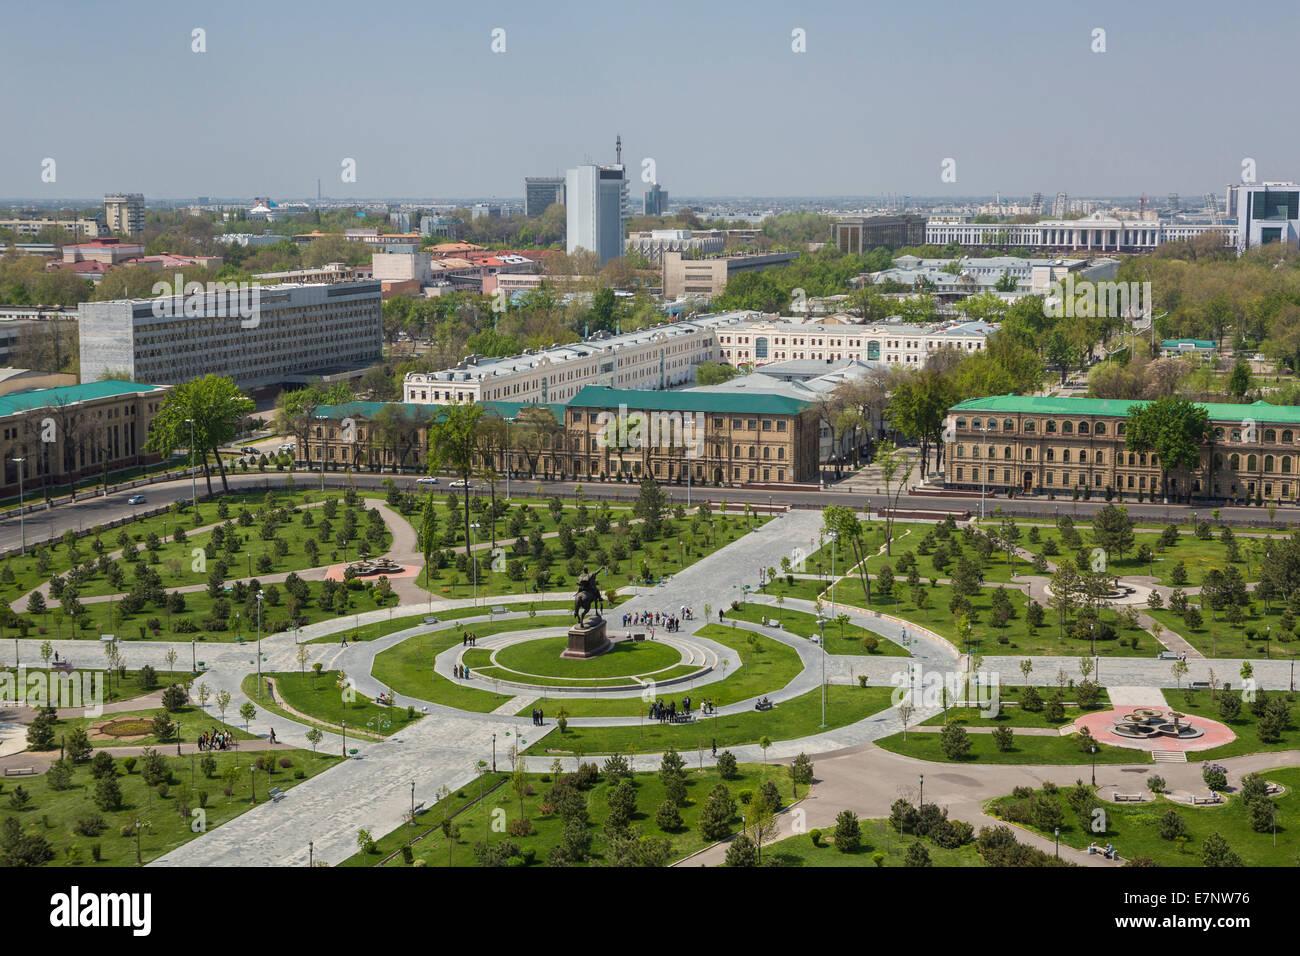 Amir Timur, Russian, Tashkent, Timur, Uzbekistan, Central Asia, Asia, architecture, center, city, colourful, downtown, - Stock Image